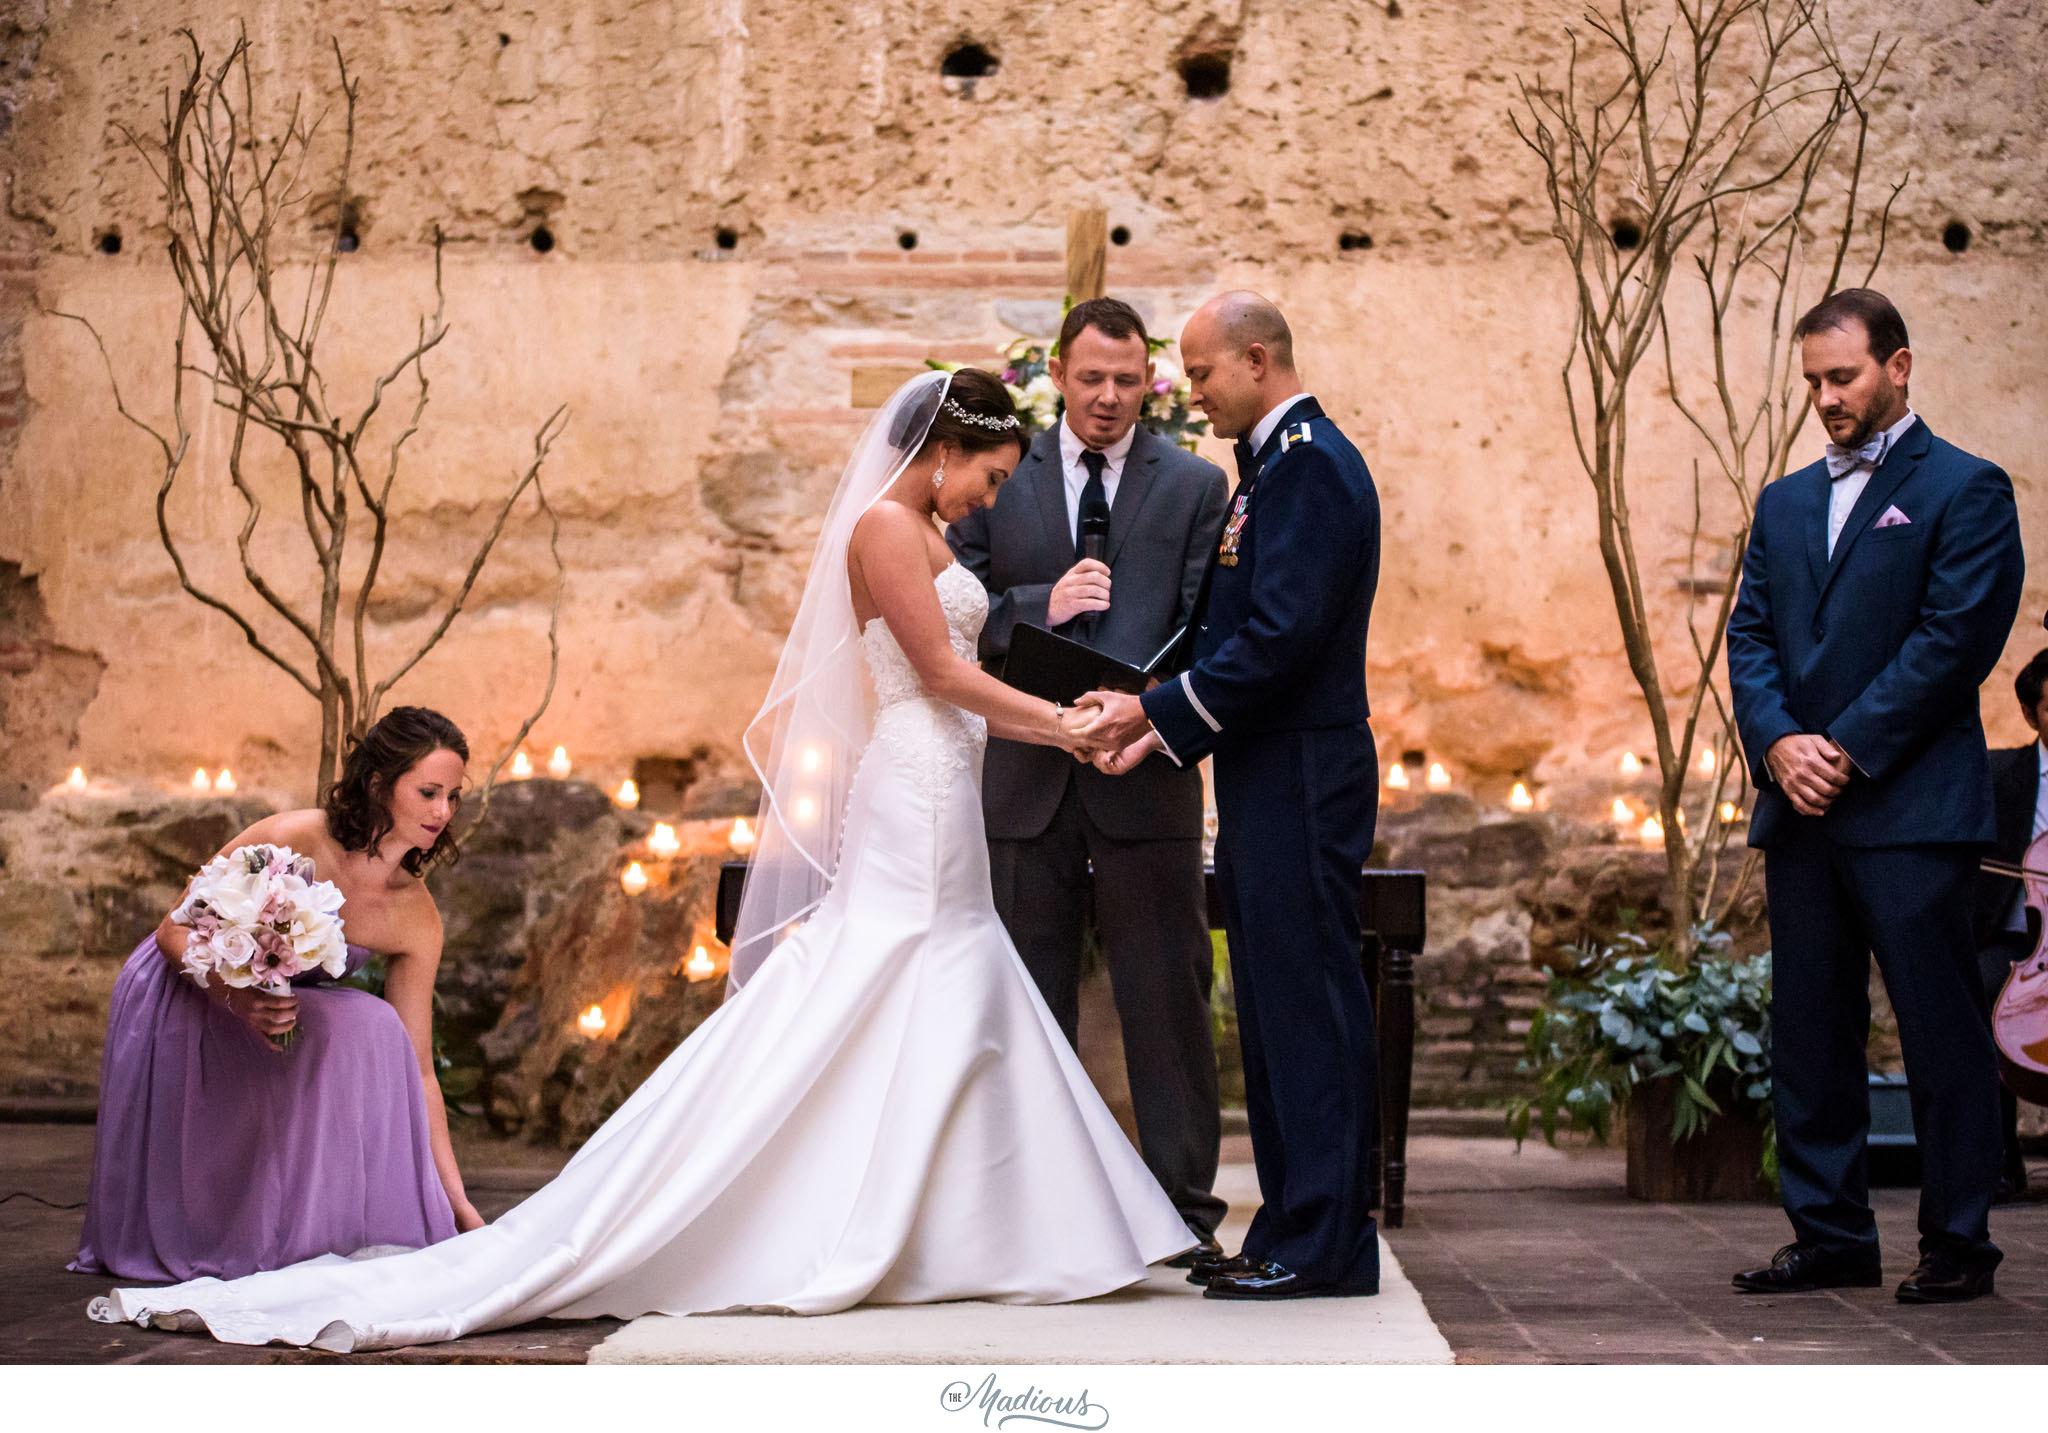 Leigh_Rob_Antigua_Guatemala_Santa_Clara_Destination_Wedding_50.JPG